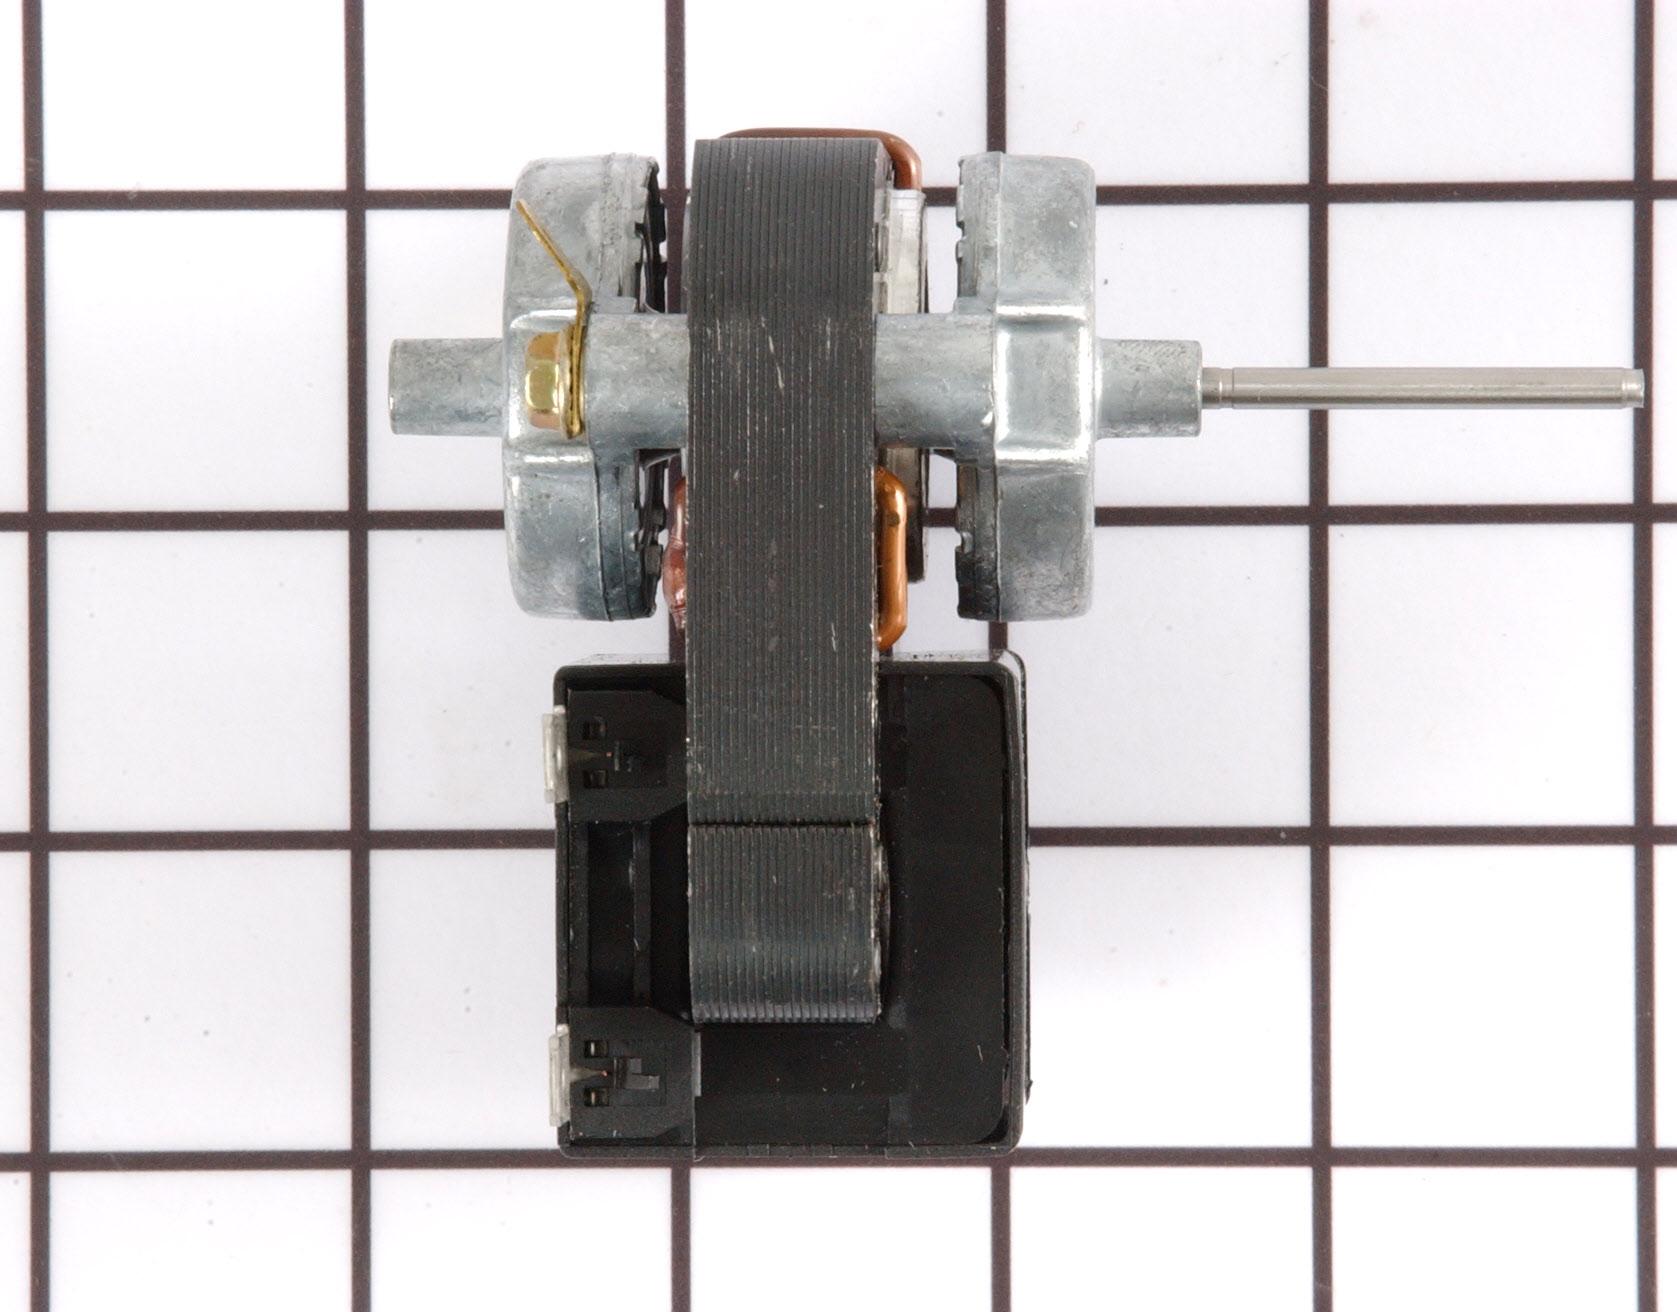 Kenmore Refrigerator Part # WP10513803 - Evaporator Fan Motor